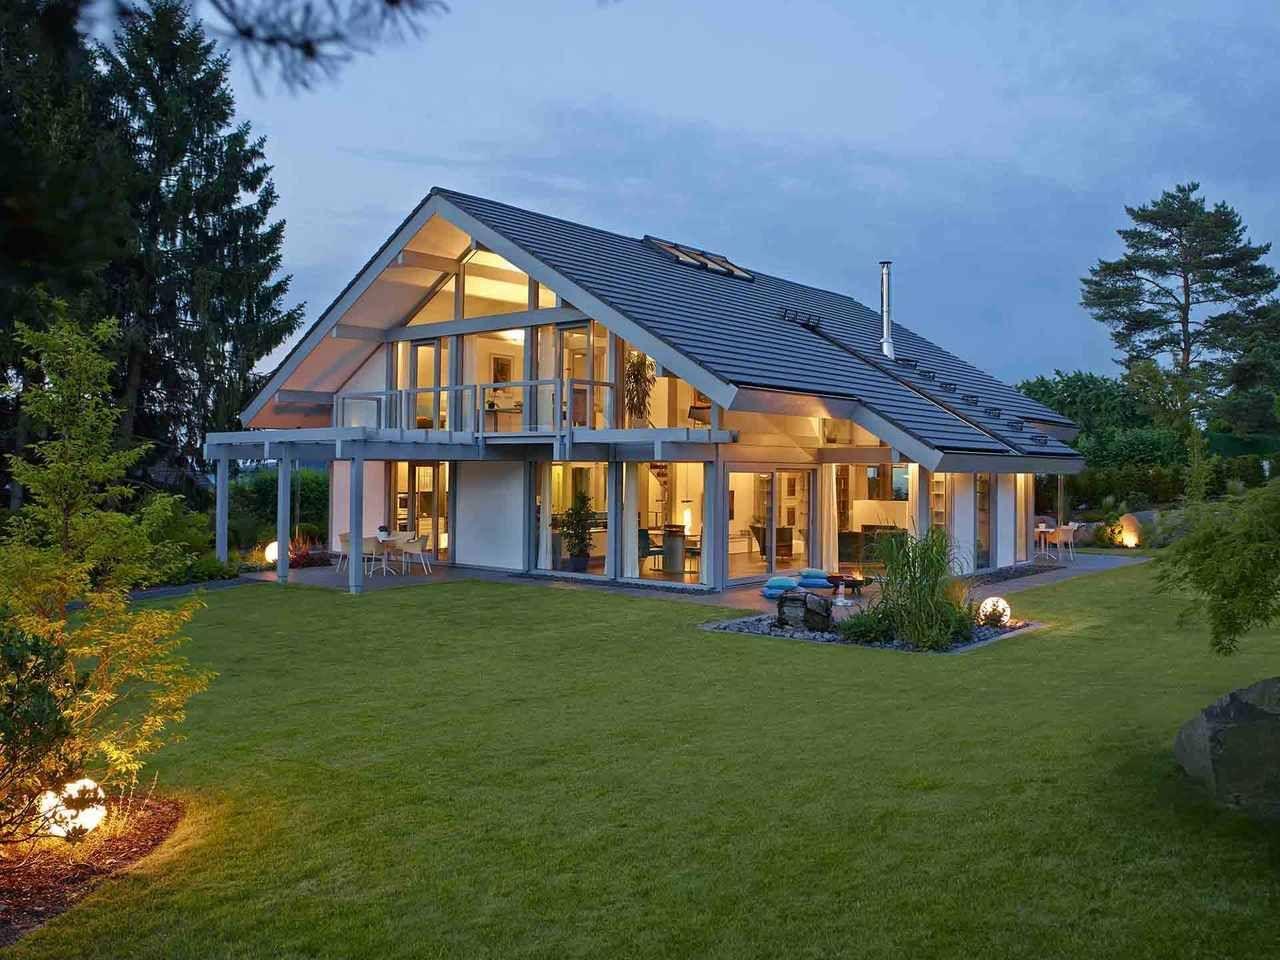 Davinci Haus Mh Gebhardshain 3 Style At Home Architektur Kniestock